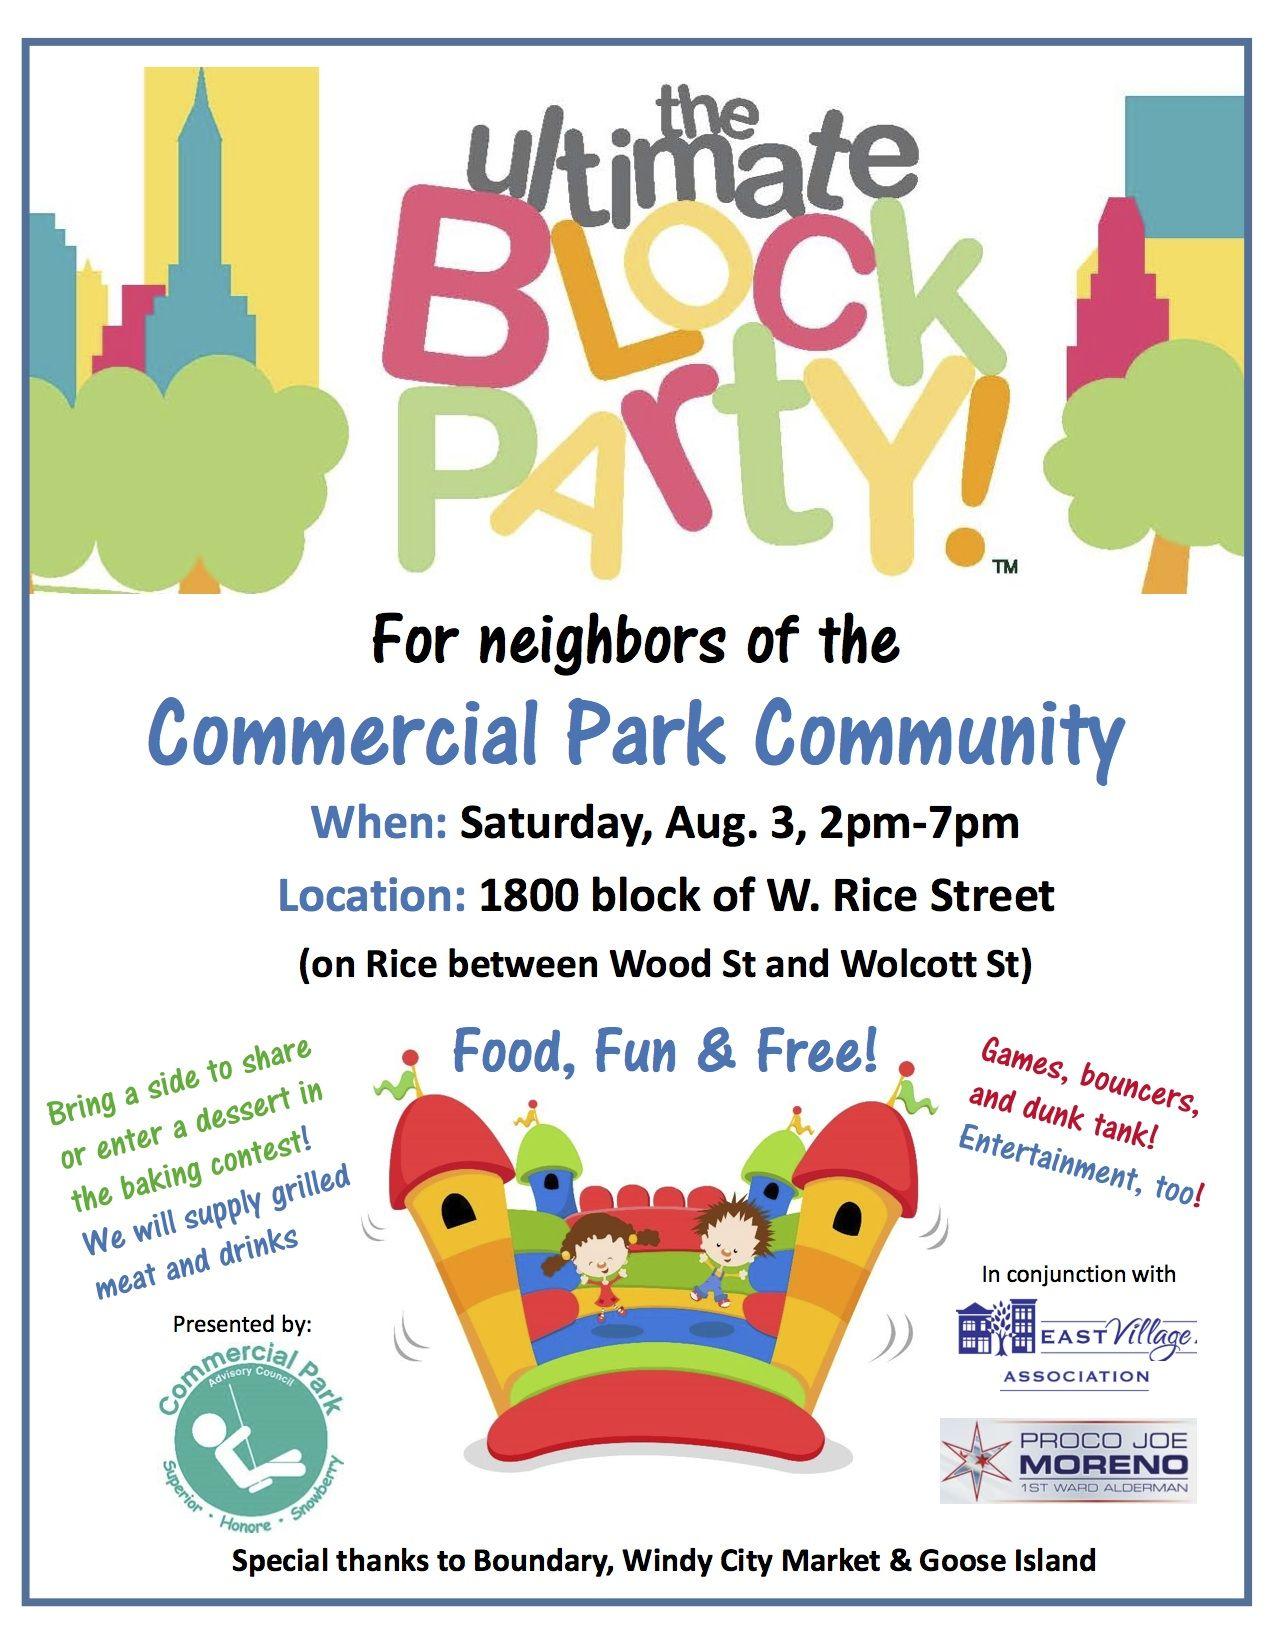 free block party clip art.